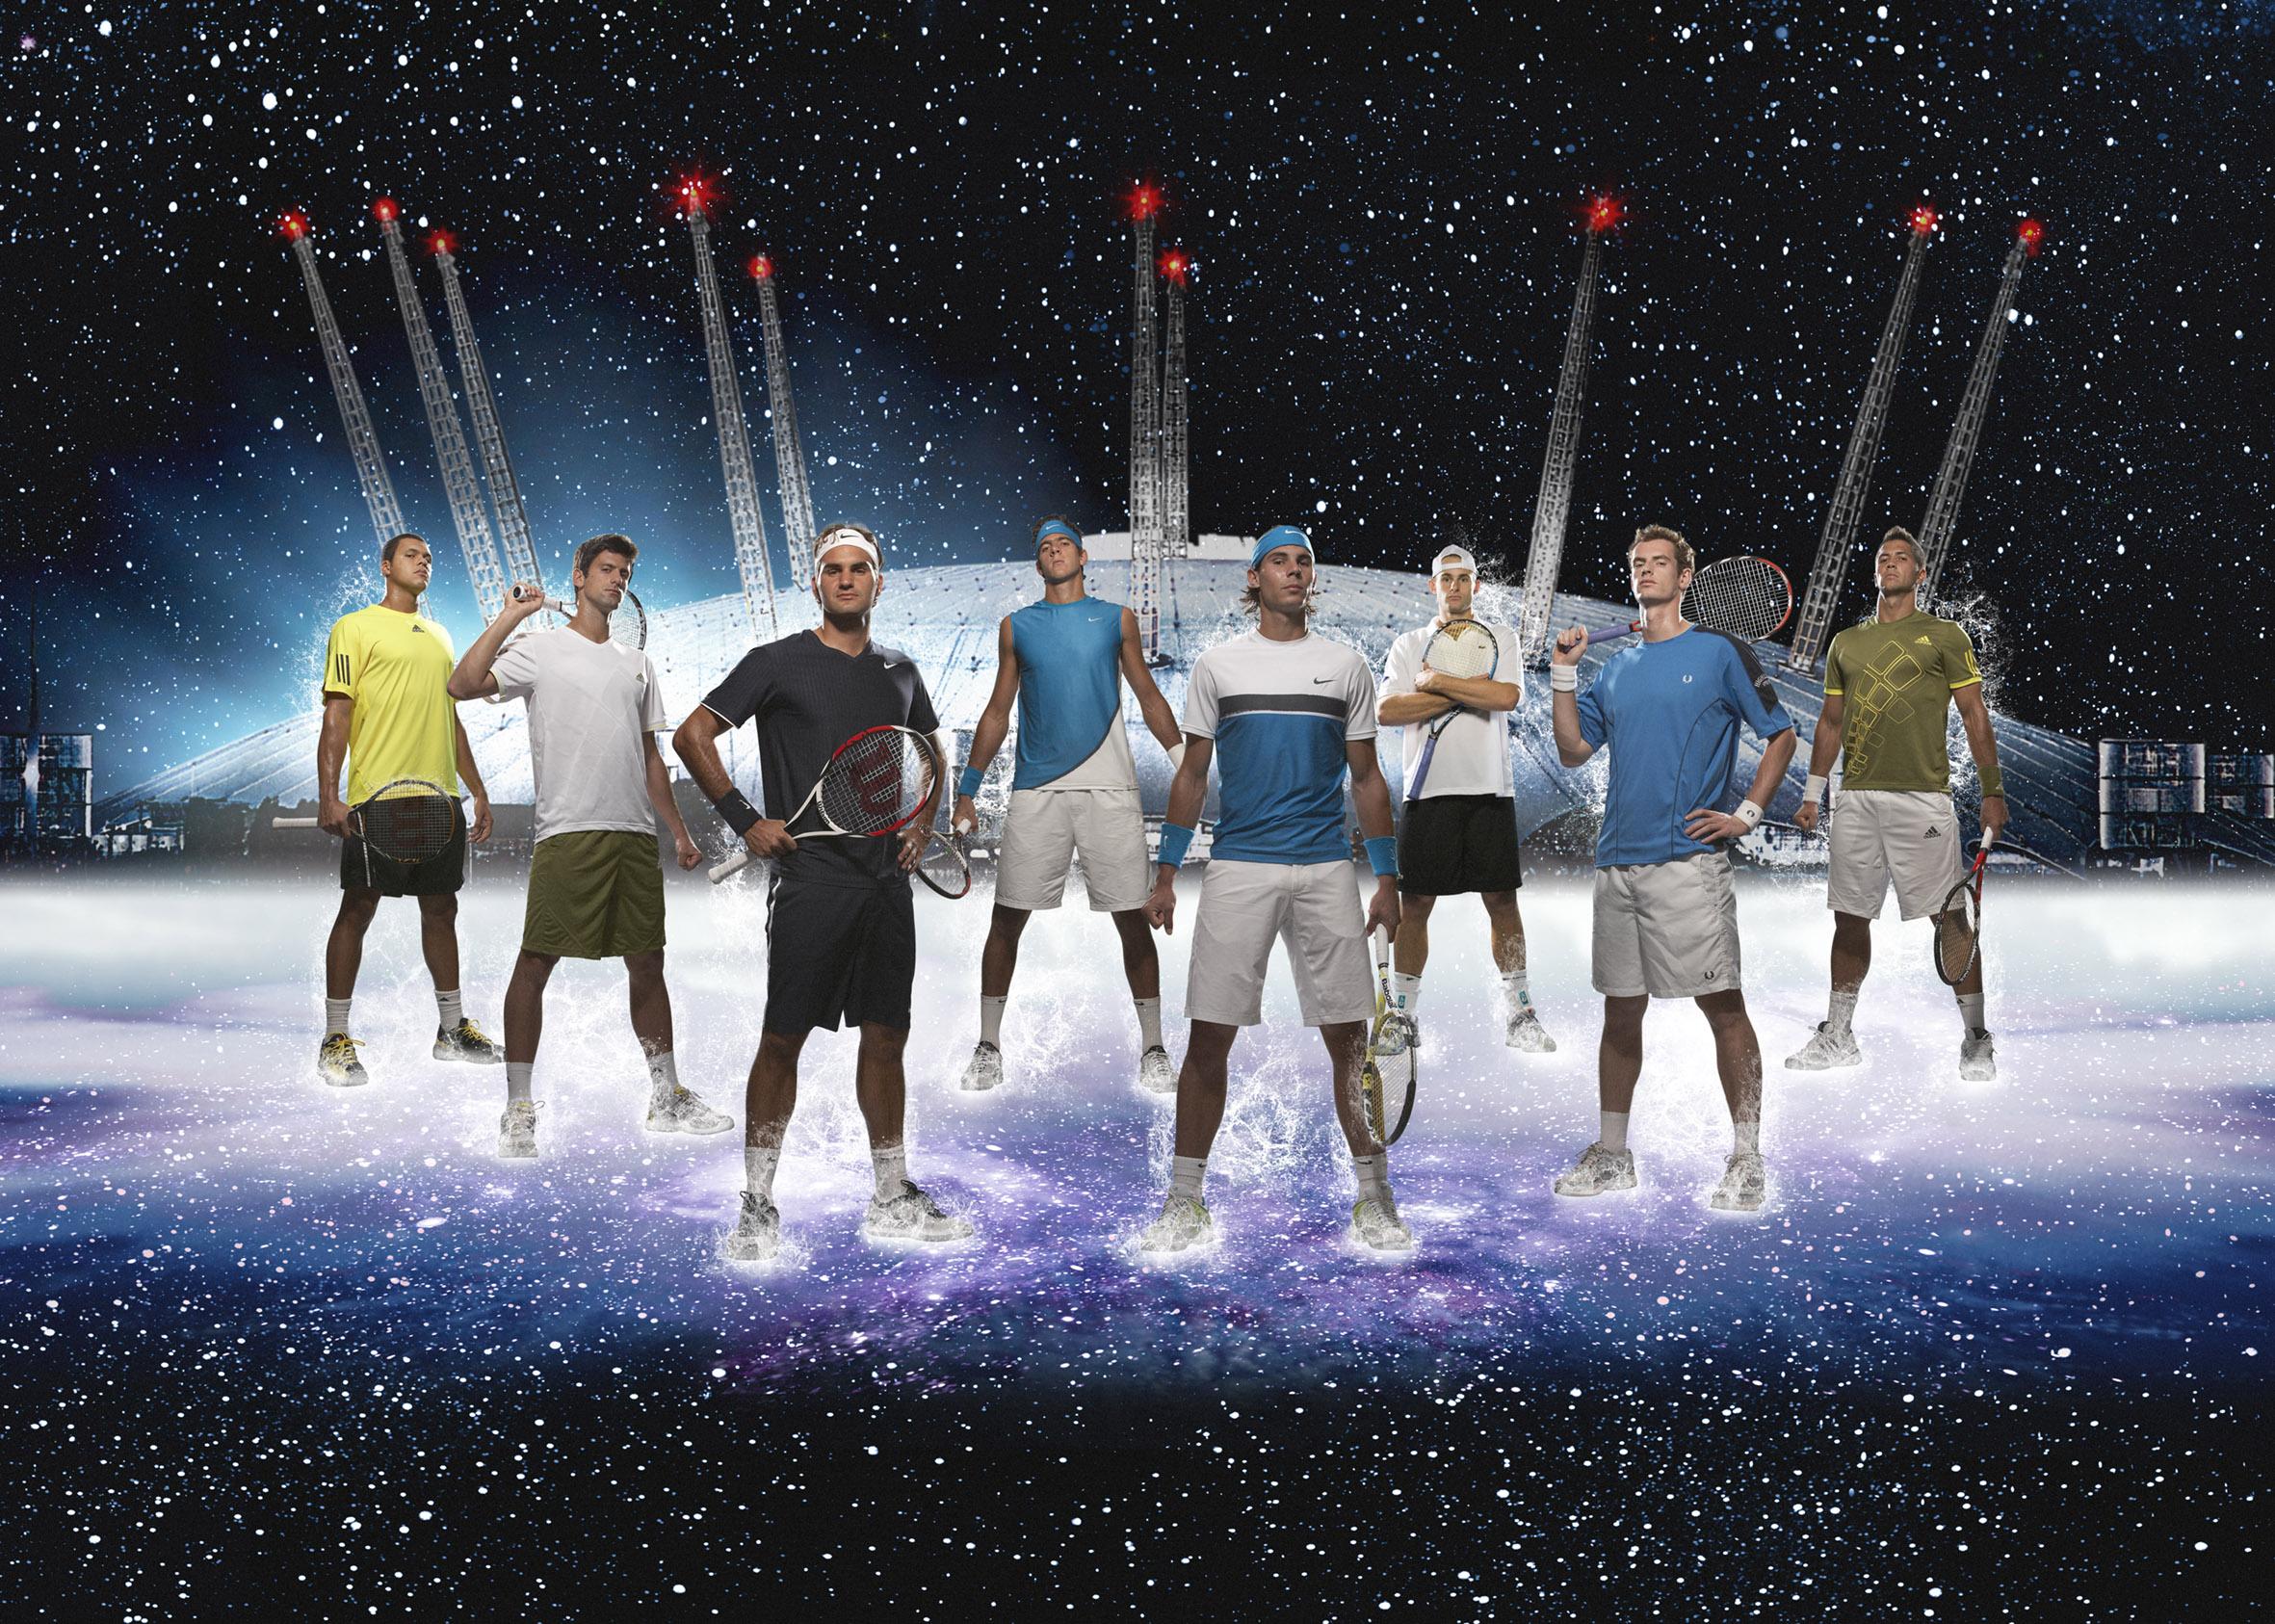 Turneul Campionilor BARCLAYS ATP WORLD TOUR FINALS   tenisdecampro 2362x1686